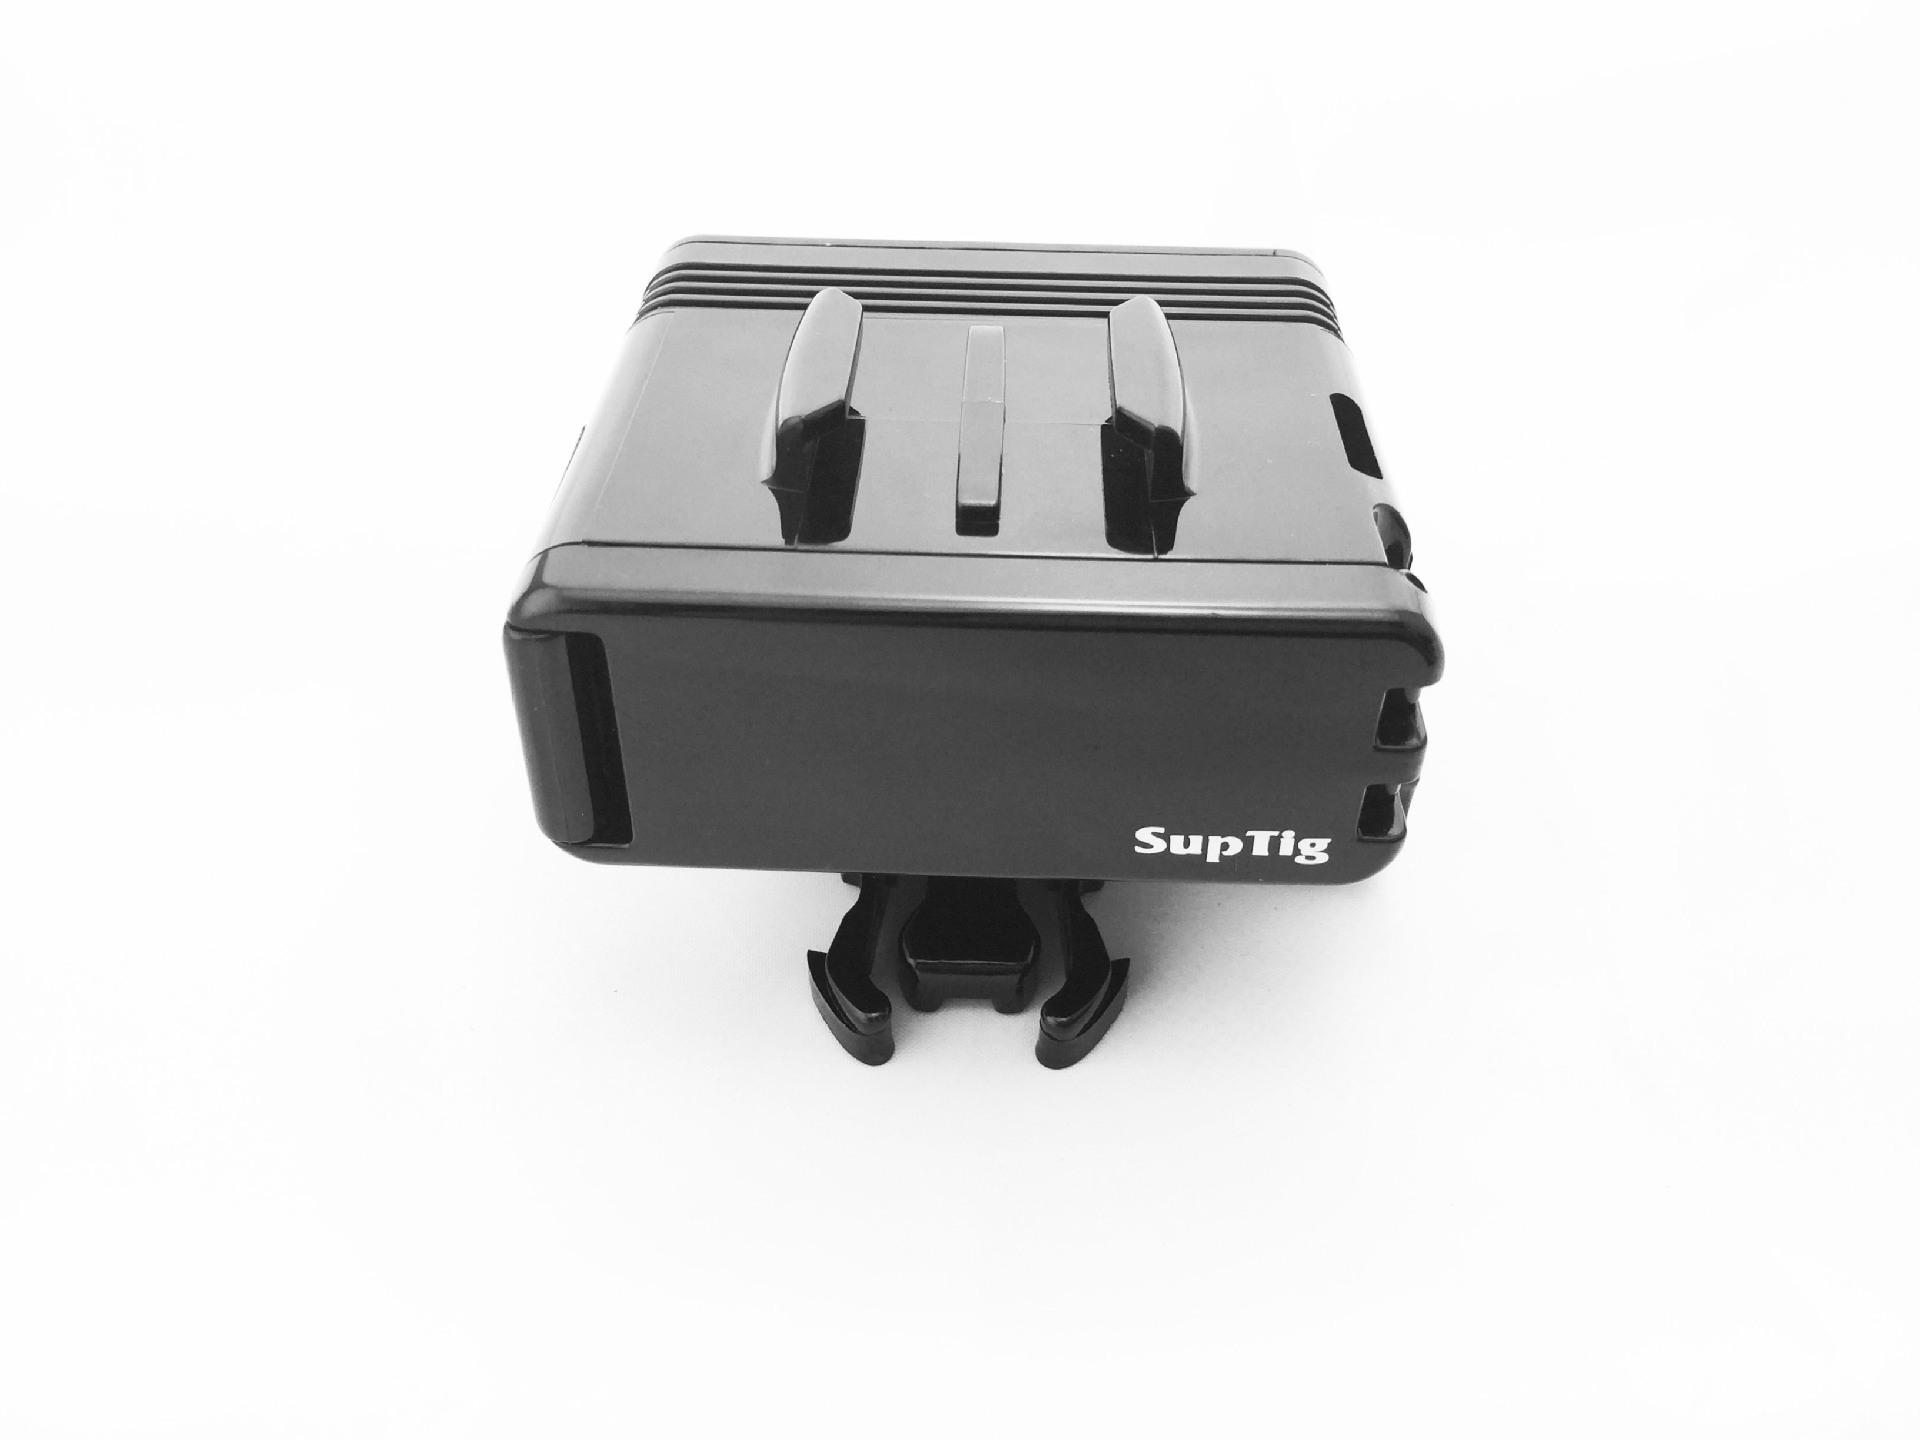 GoPro Accessories Underwater 30M Waterproof 3 LED Diving Light Lamp for XIAOMI YI GoPro Hero 4 3+ 3 Camera SJCAM SJ4000 SJ6000